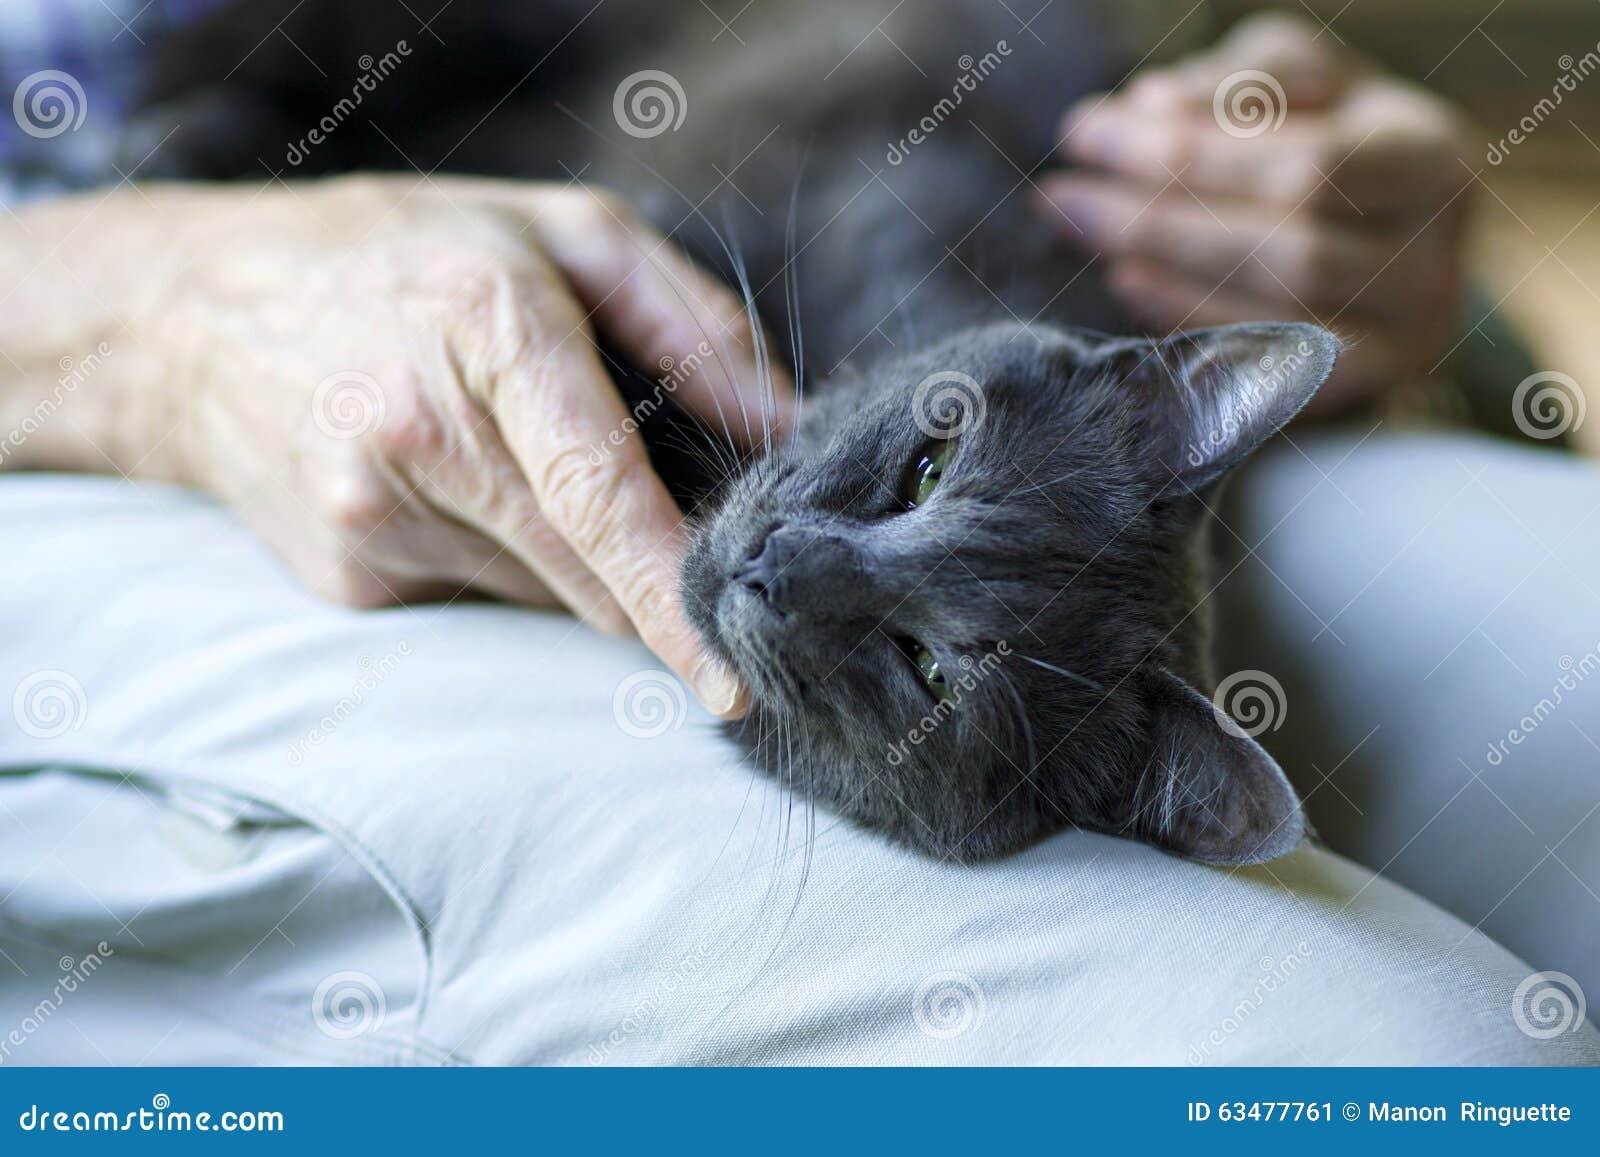 Comforting a Sick Cat